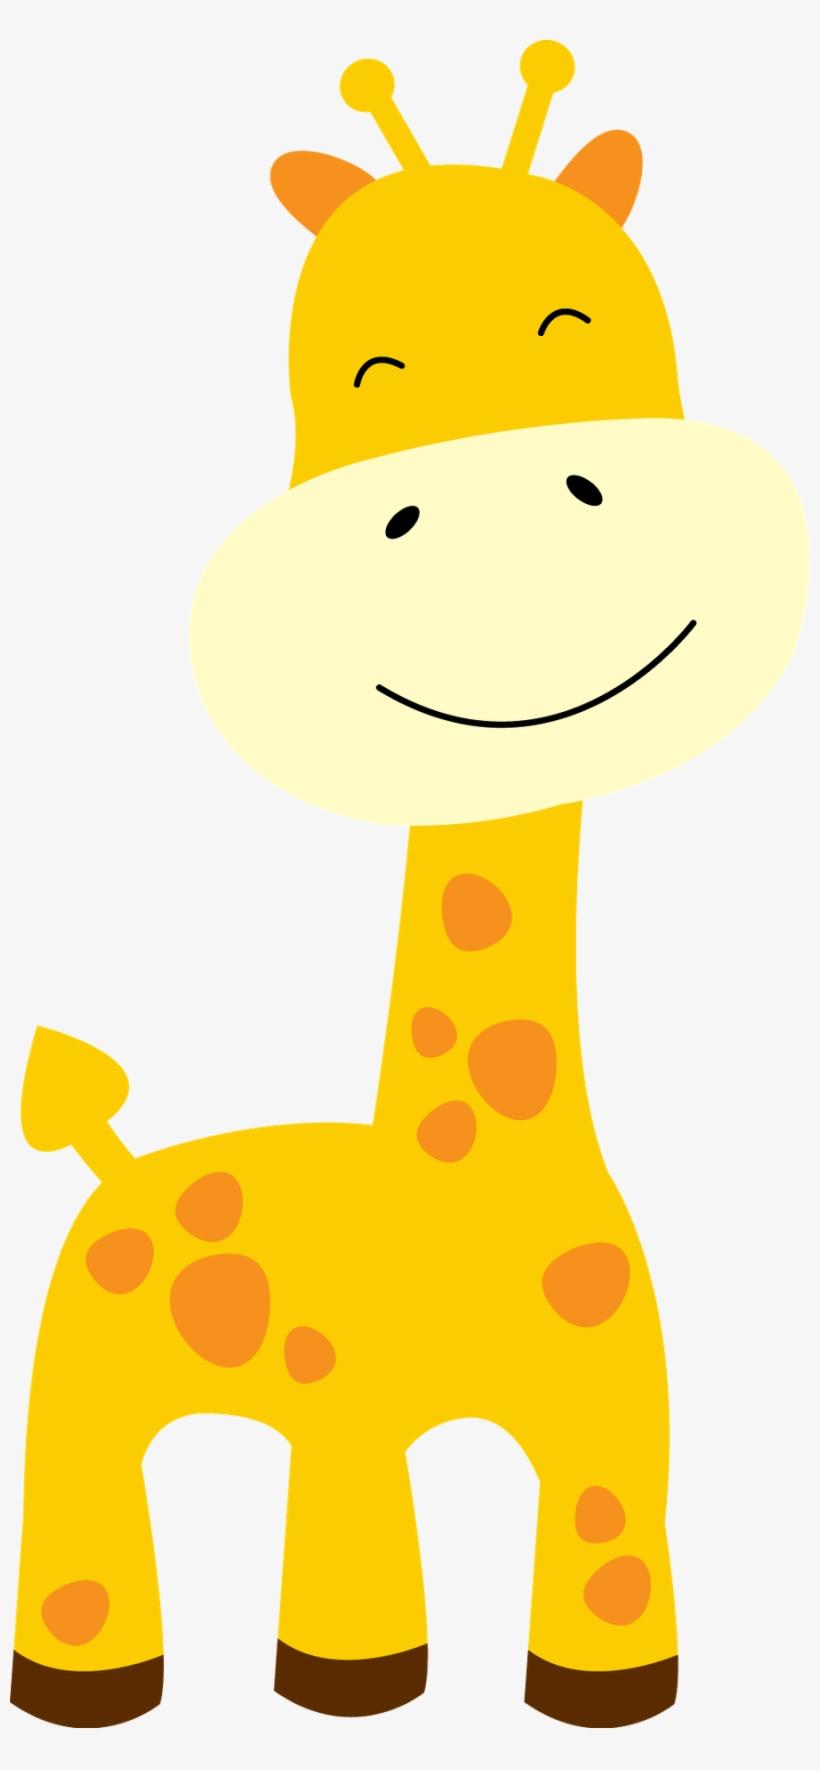 Baby Giraffes Clip Art Girafa Baby Desenho Png Image